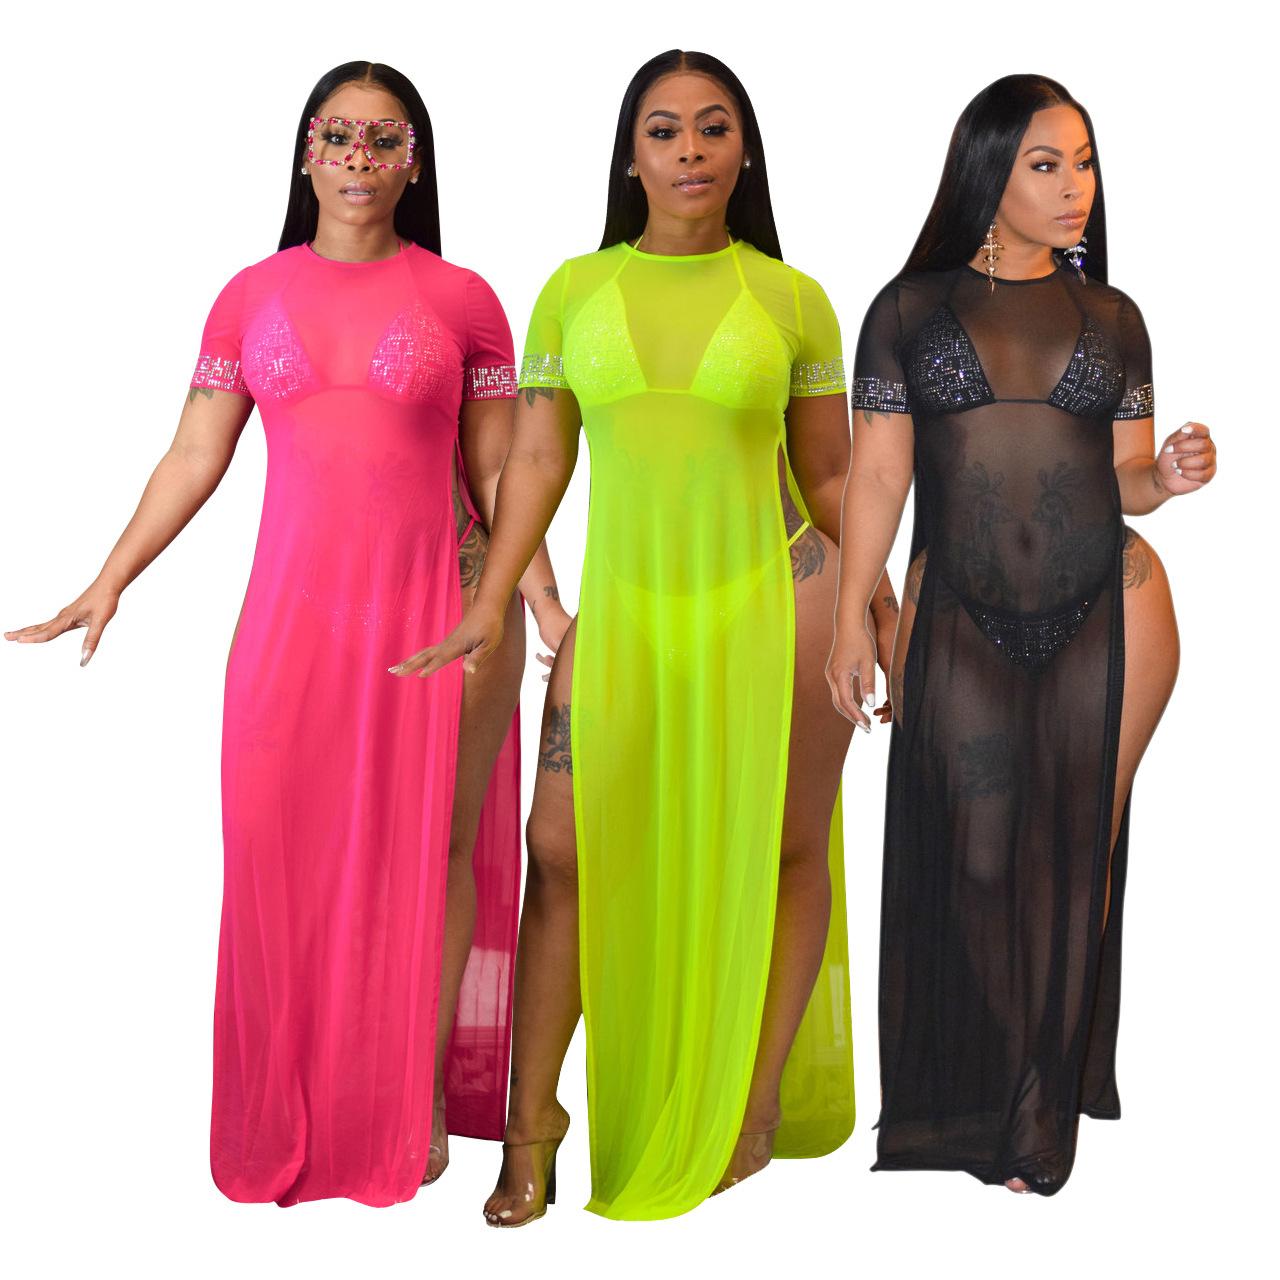 Wholesale Short Sleeve Swimwear See Through Long Maxi Dresses Beach Swimsuits Women's Chiffon Cover Up